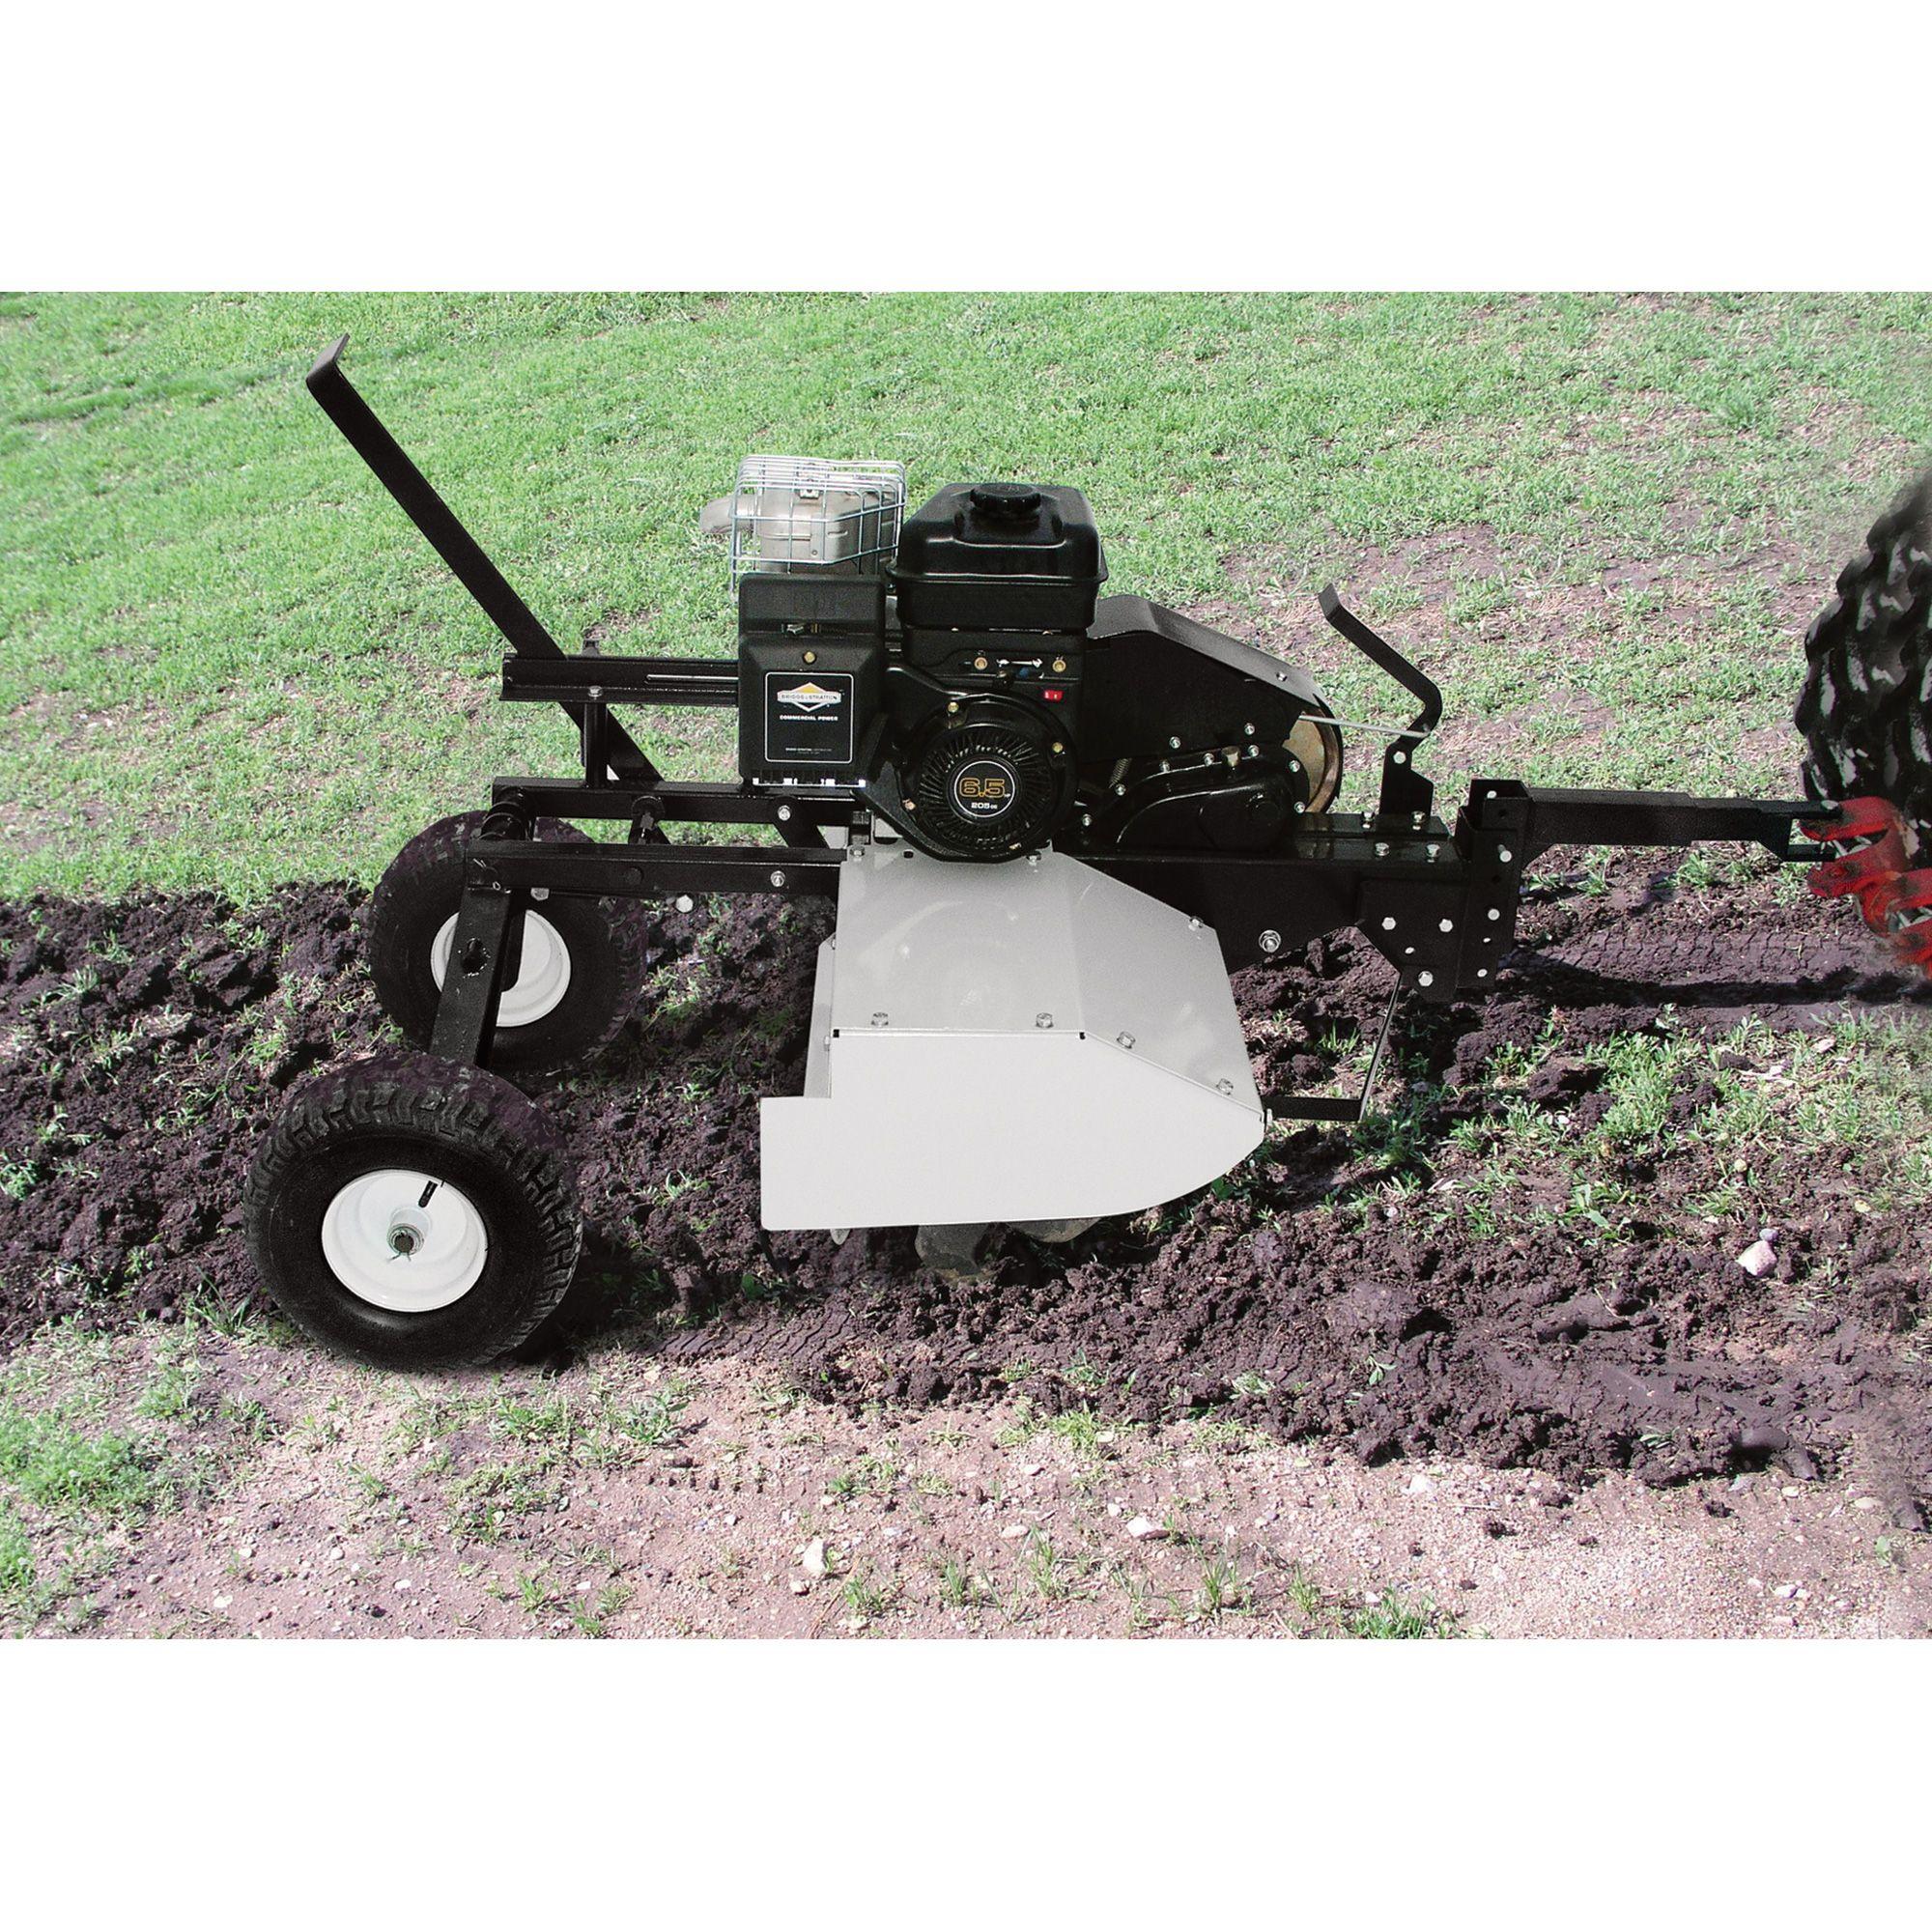 Field Tuff Tow-Behind Tiller — 36in  Width, Model# ATV-3665